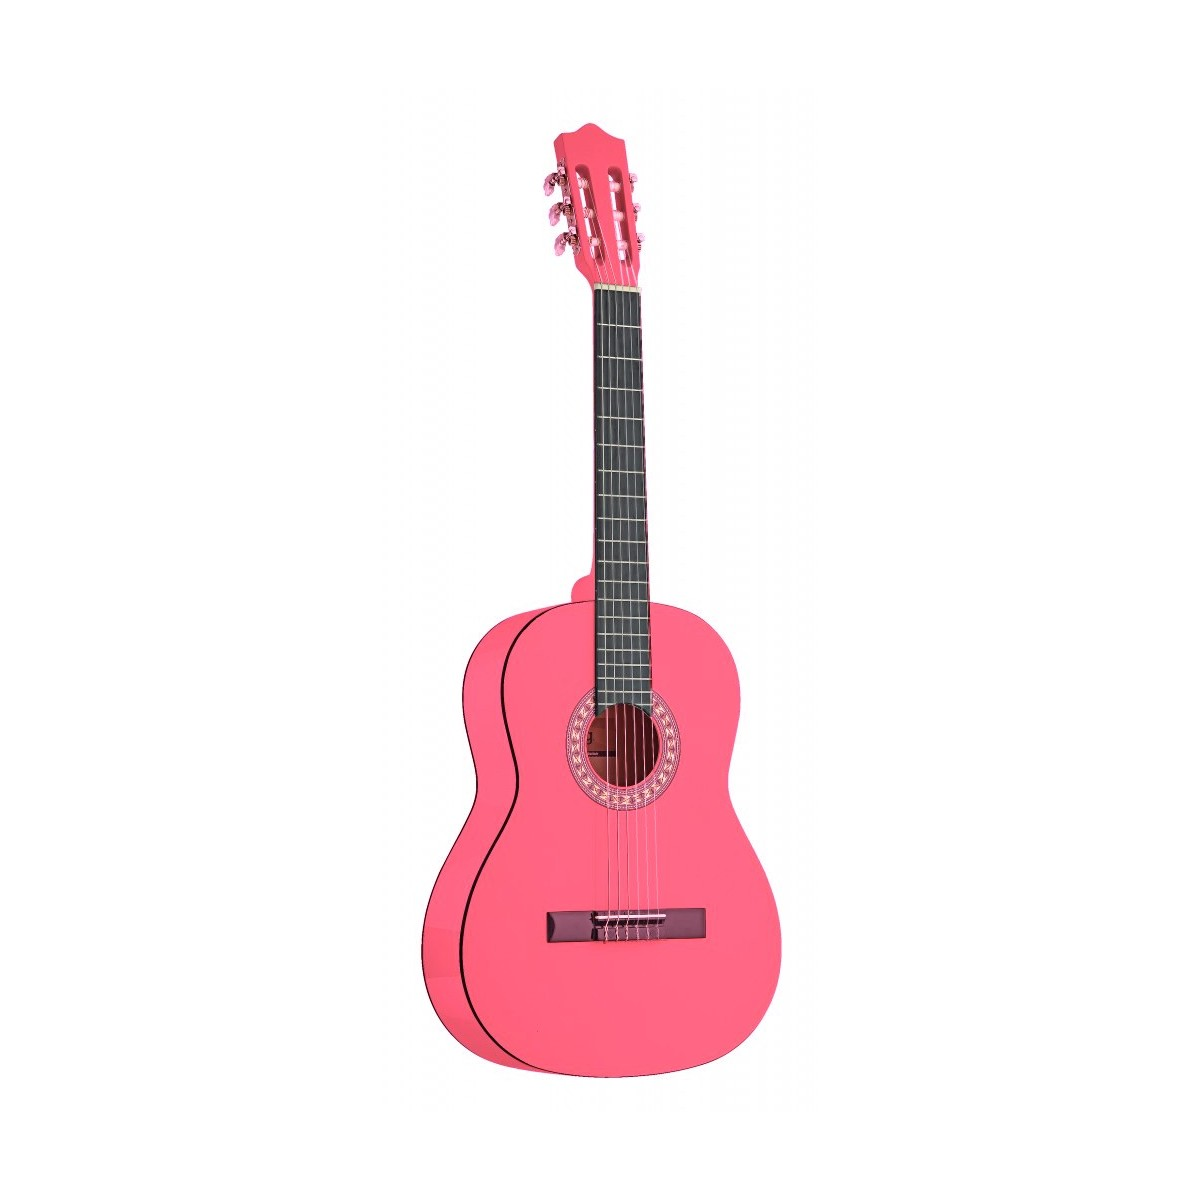 Guitare enfant 1/2 classique Rose